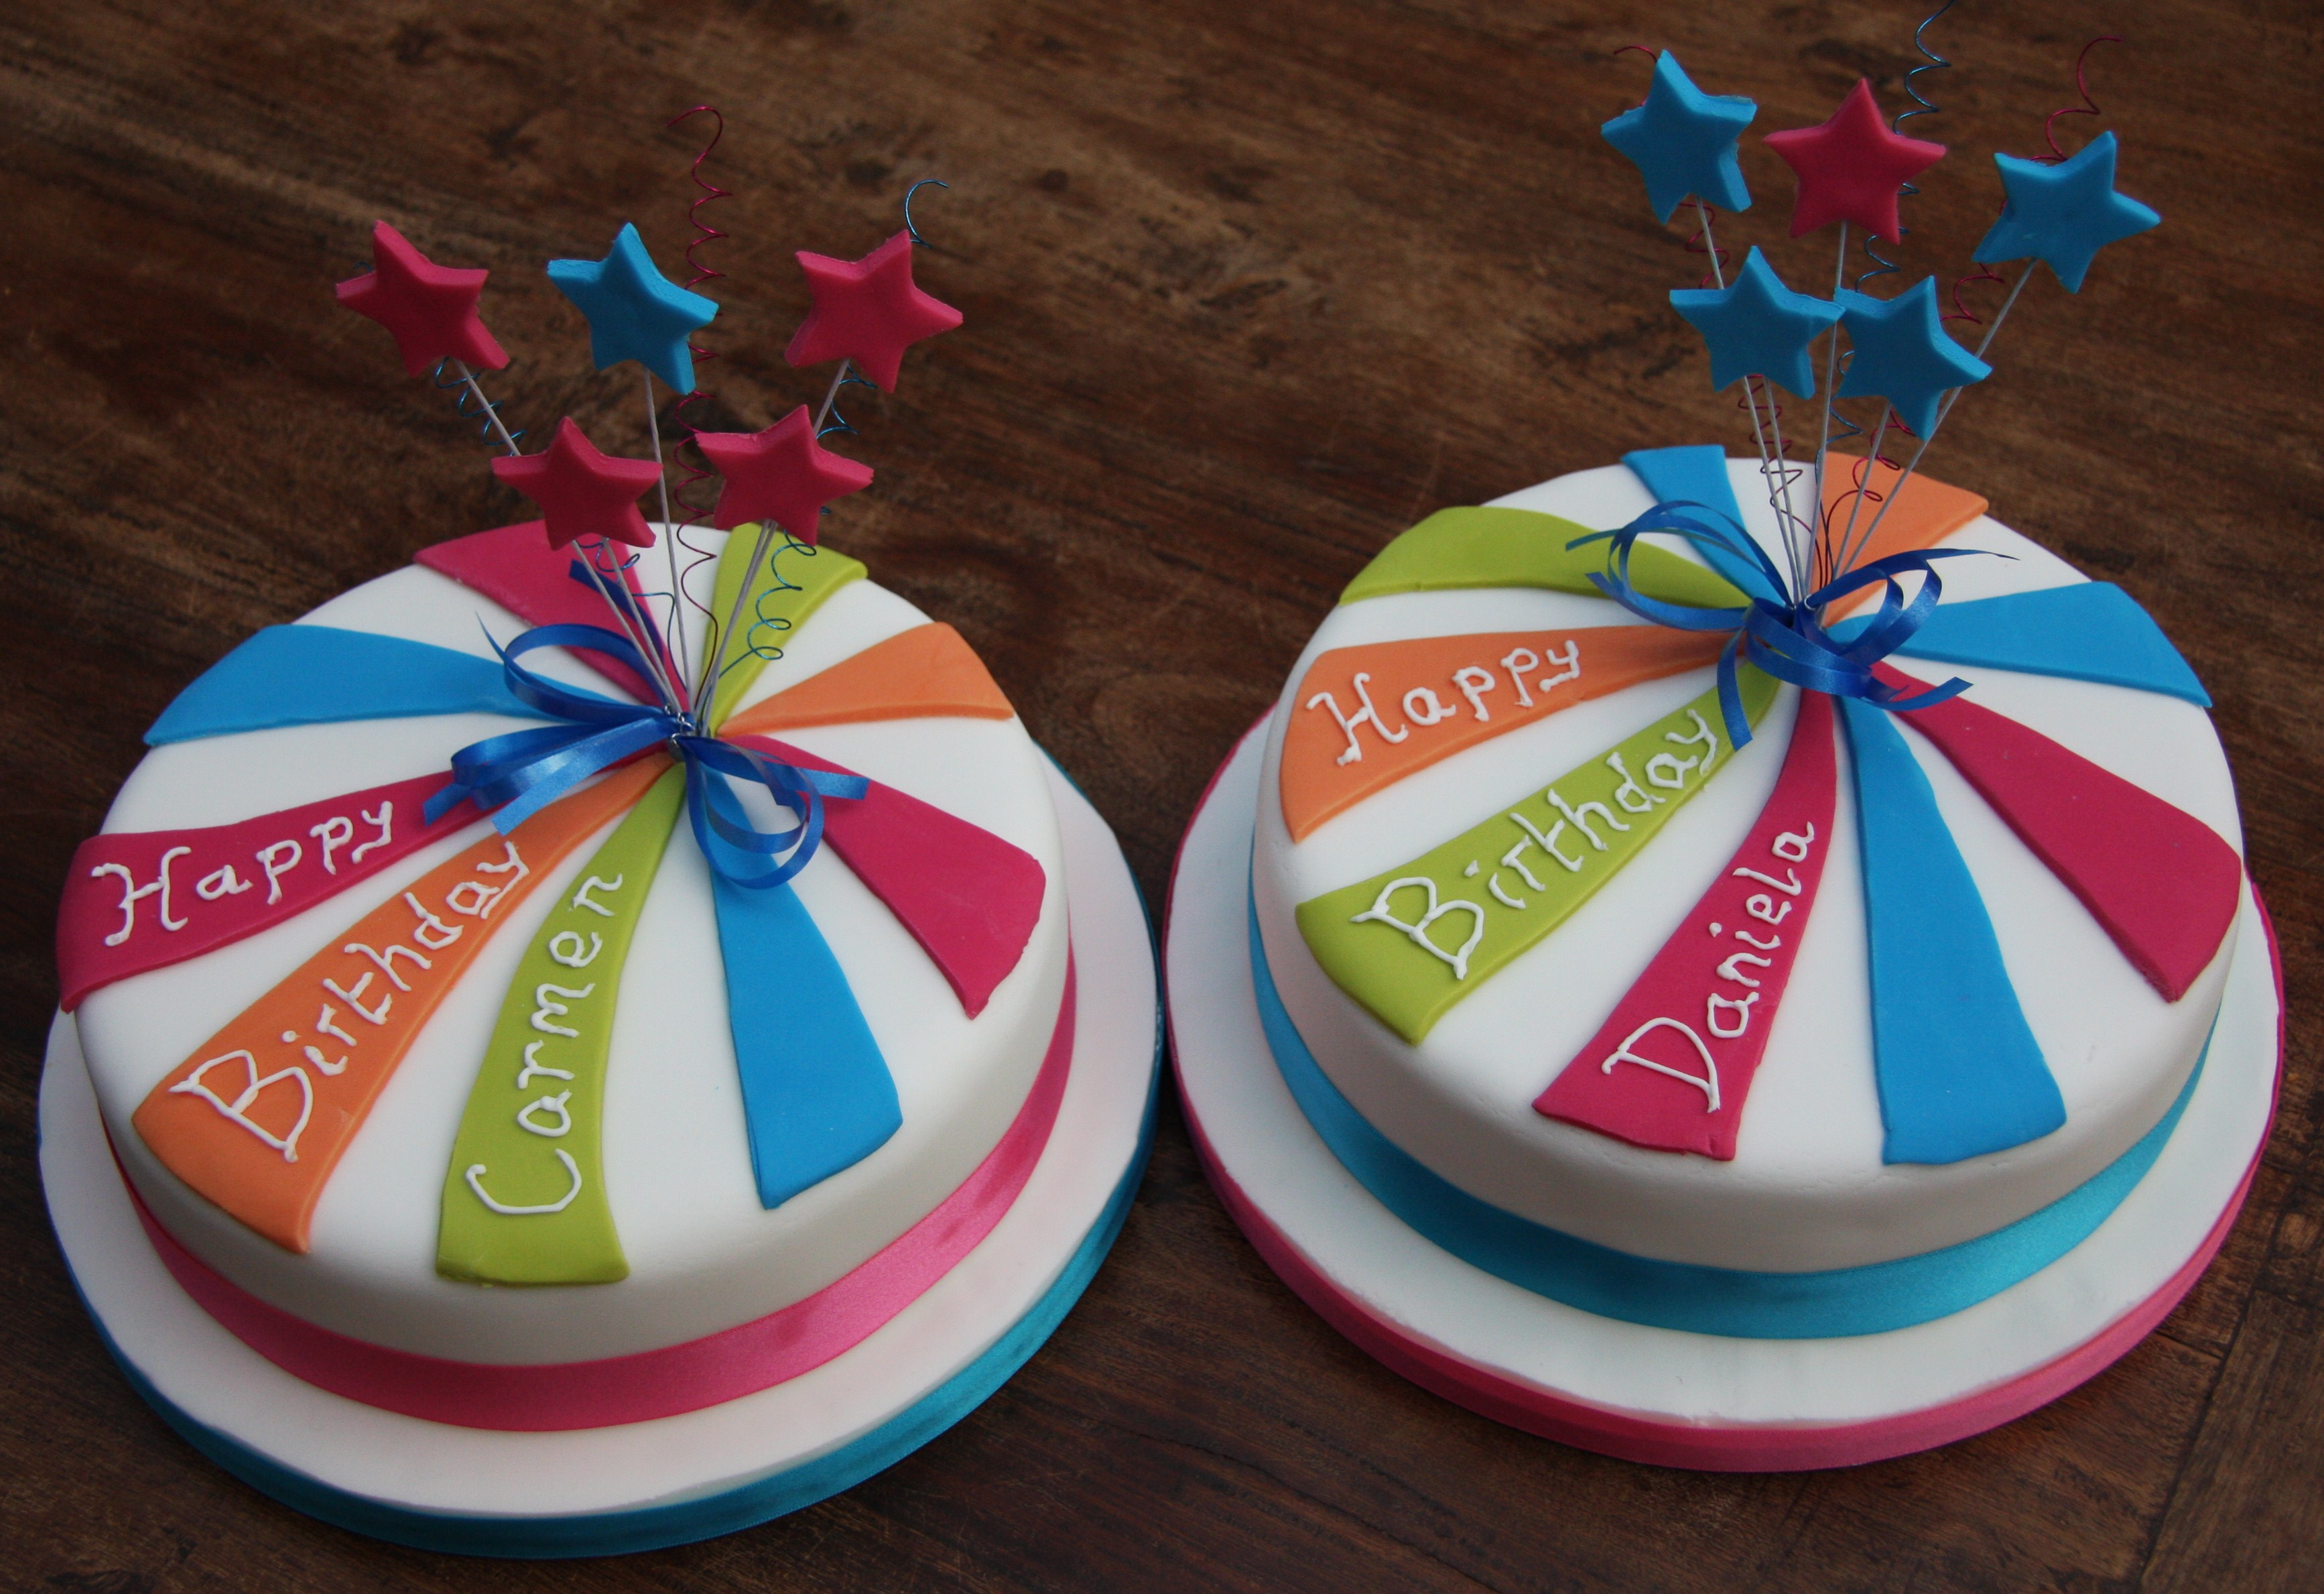 Sensational Disco Birthday Cakes Seeing Double Lovinghomemade Funny Birthday Cards Online Hendilapandamsfinfo